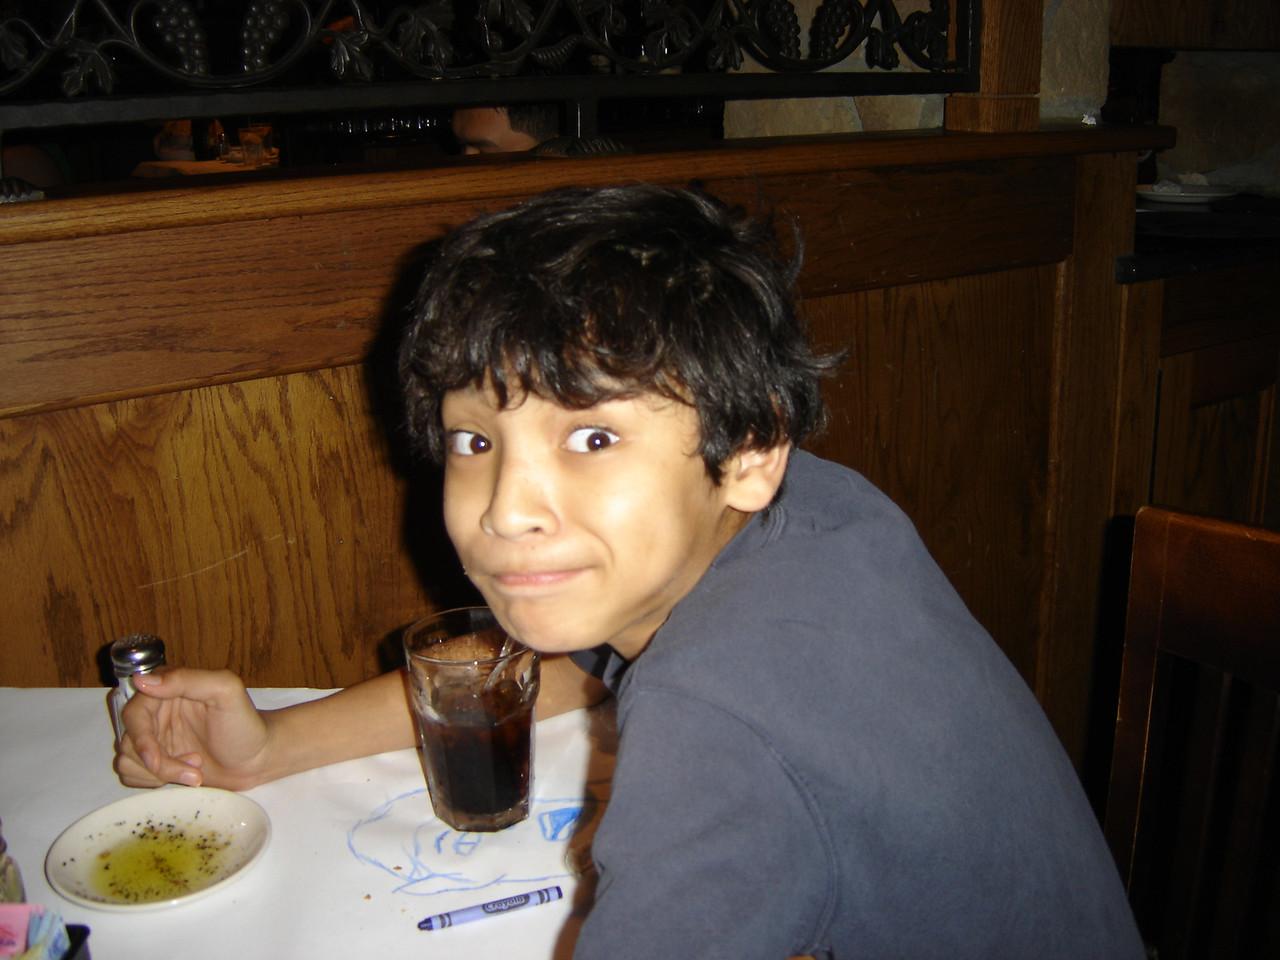 Joe's eldest son Brandon.